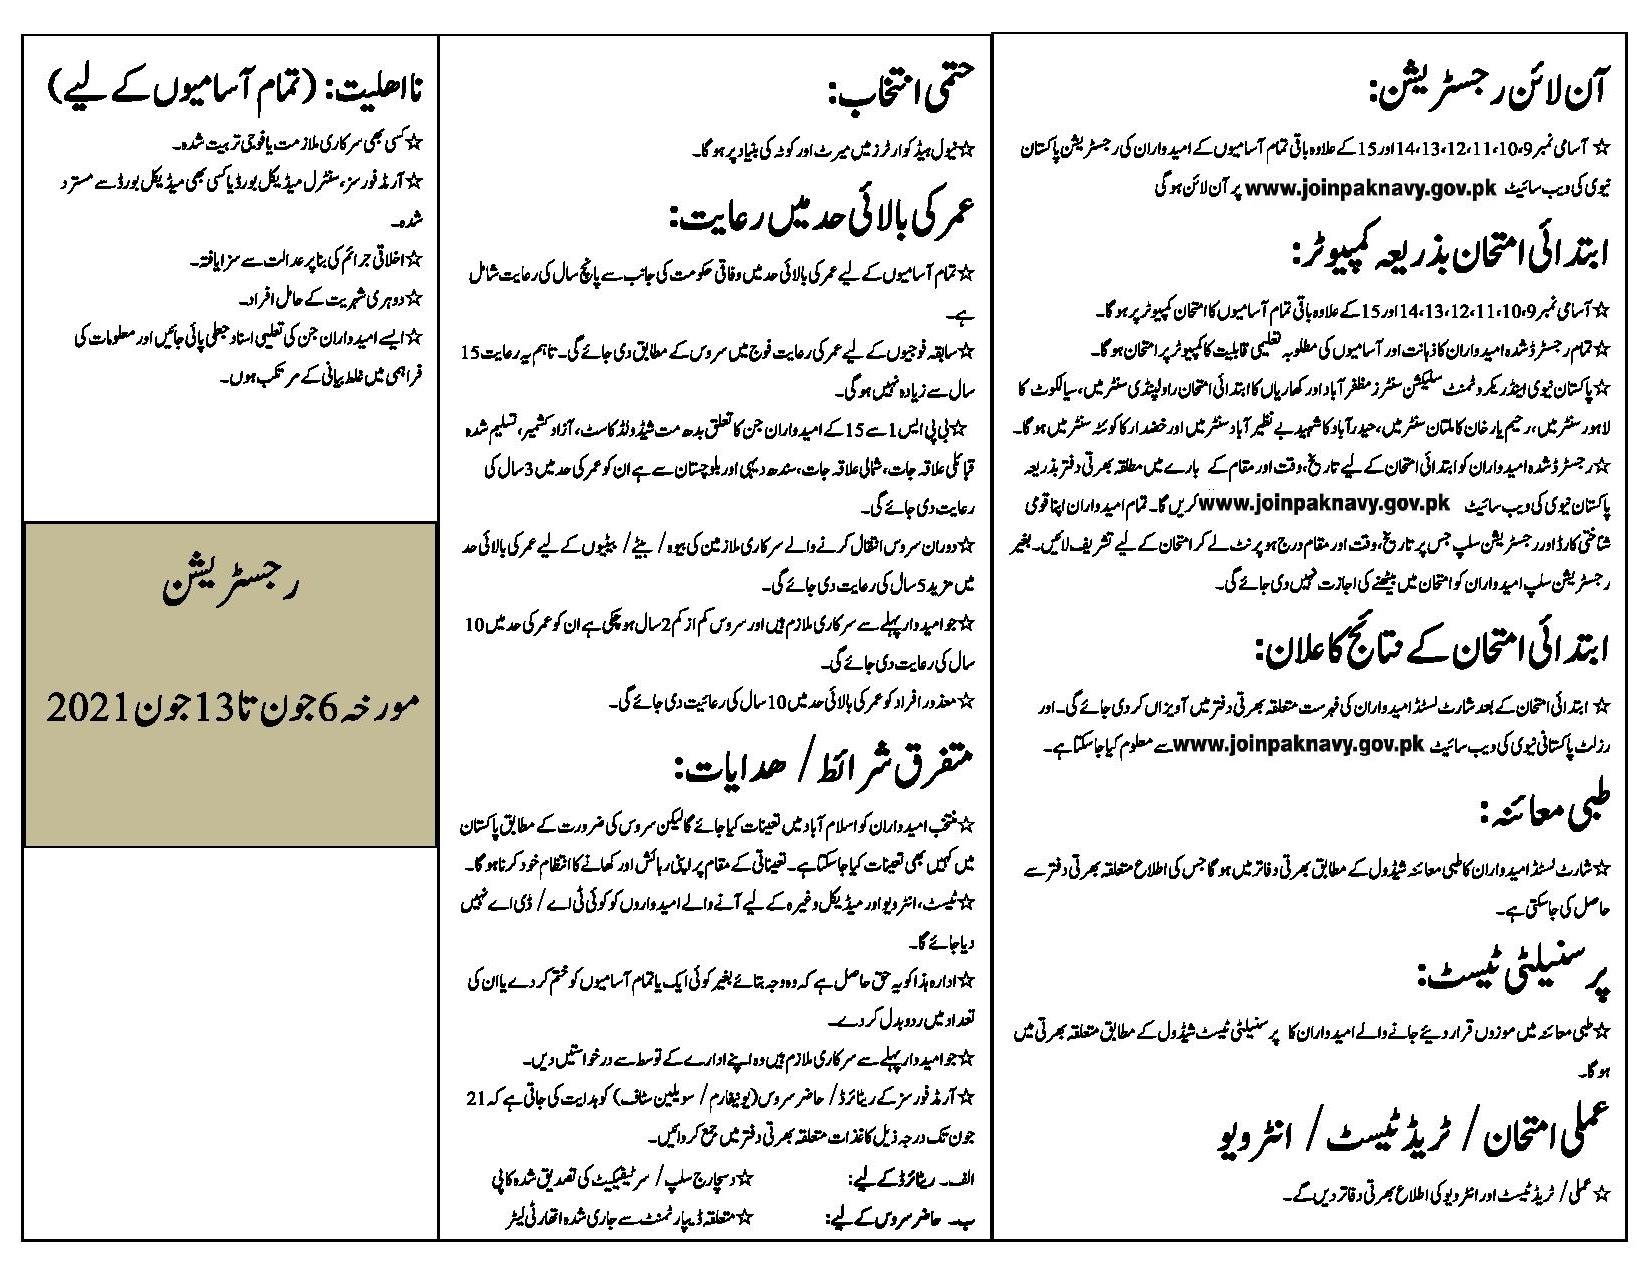 Join Pakistan Navy As Civilian Jobs 2021 II Pak Navy Civilian Jobs 2021 for Male & Female